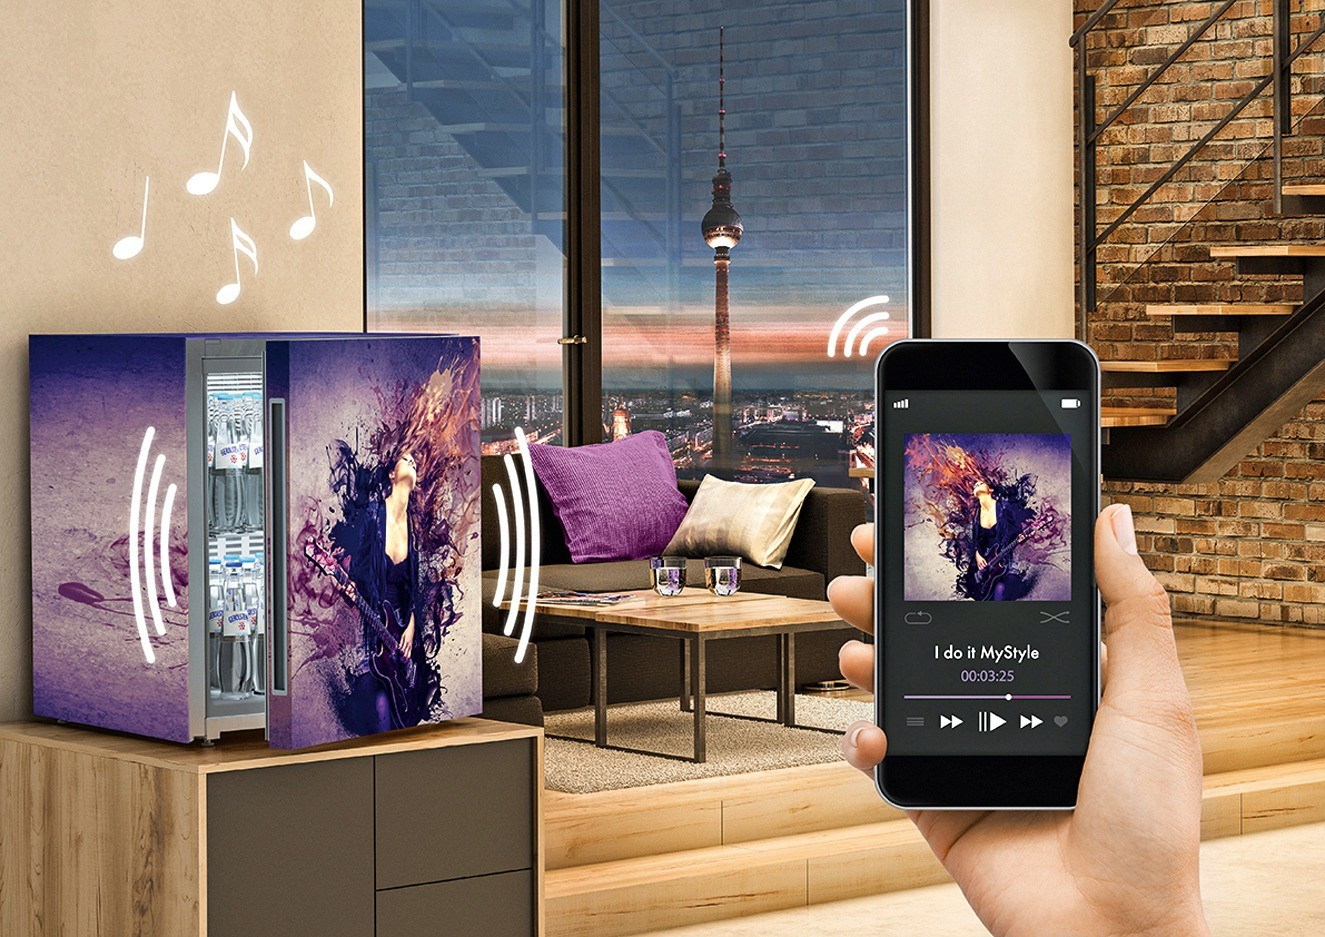 Холодильник Liebherr способен  воспроизводить музыку со смартфона